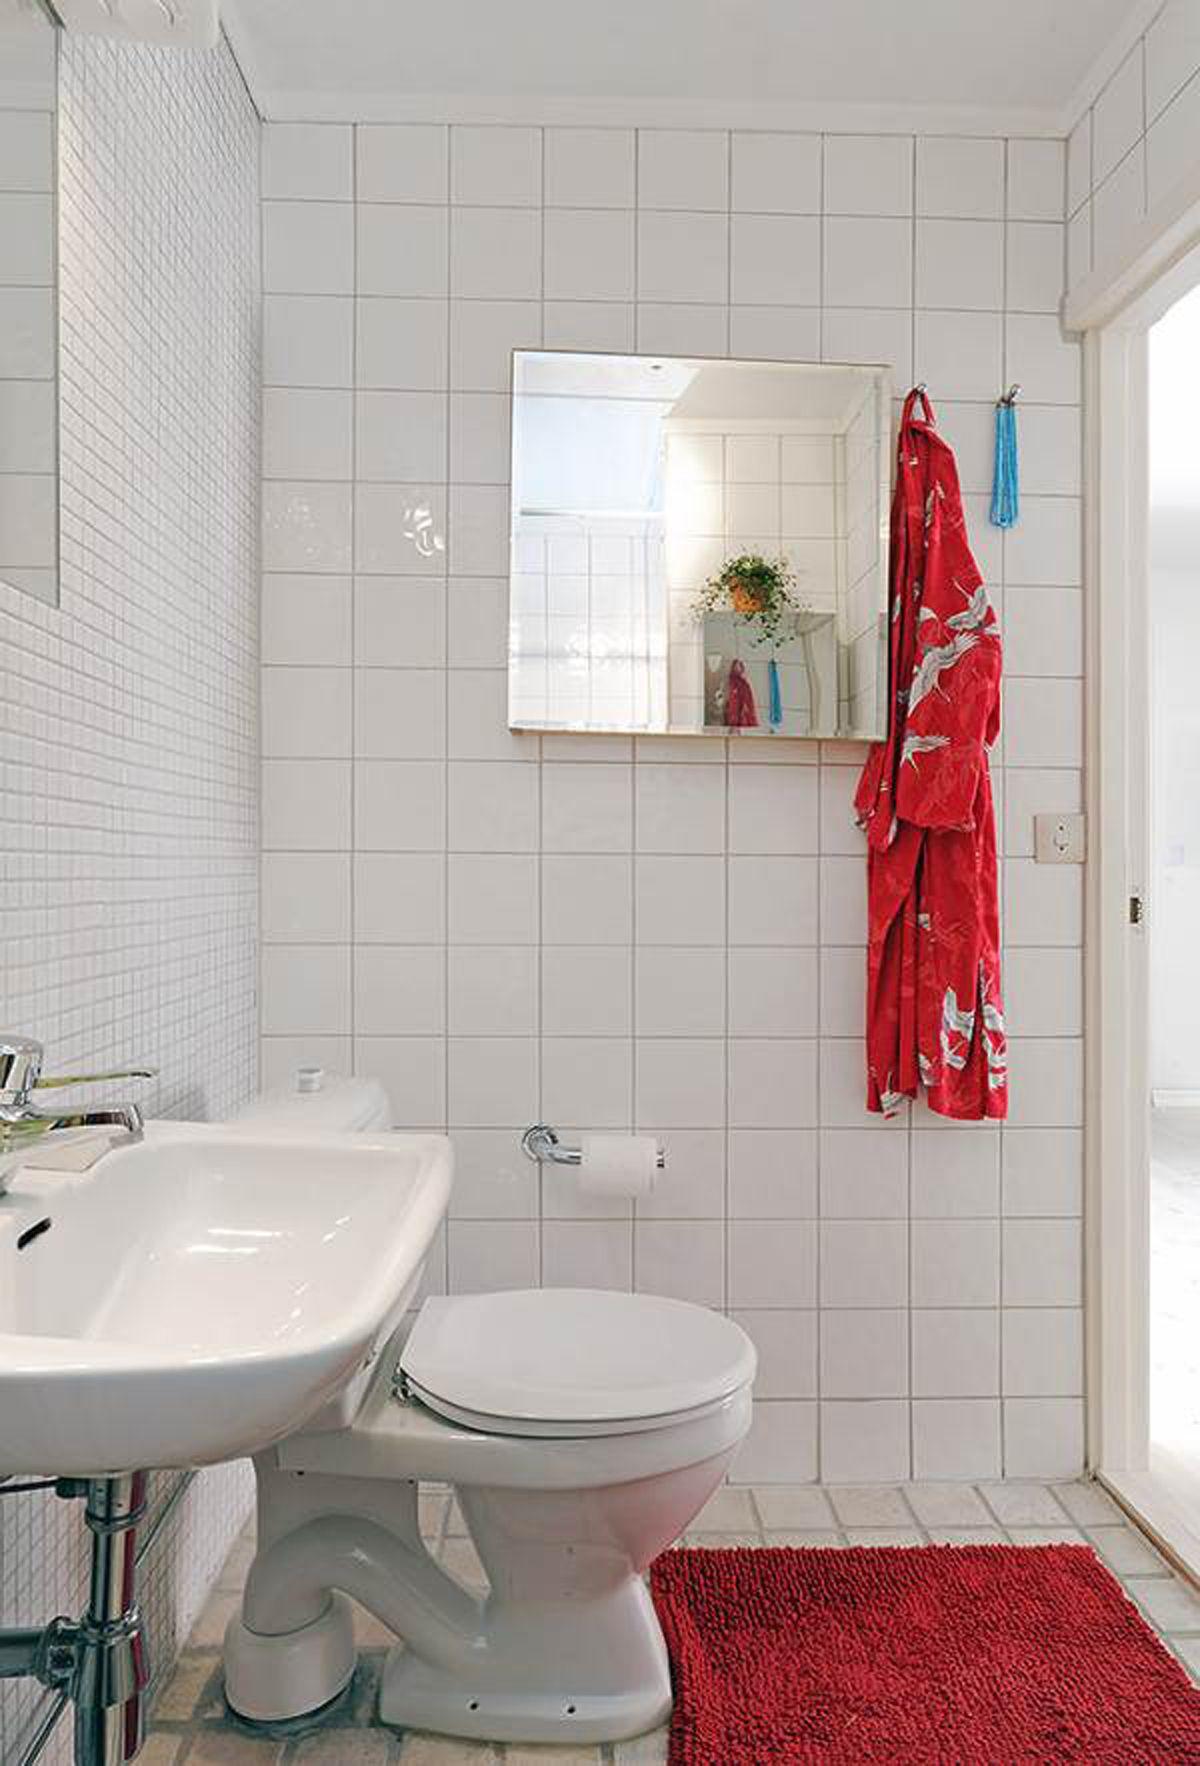 How To Make A Compact Bathroom Look Bigger Trendy Bathroom Tiles Bathroom Design Small Small Space Bathroom Design